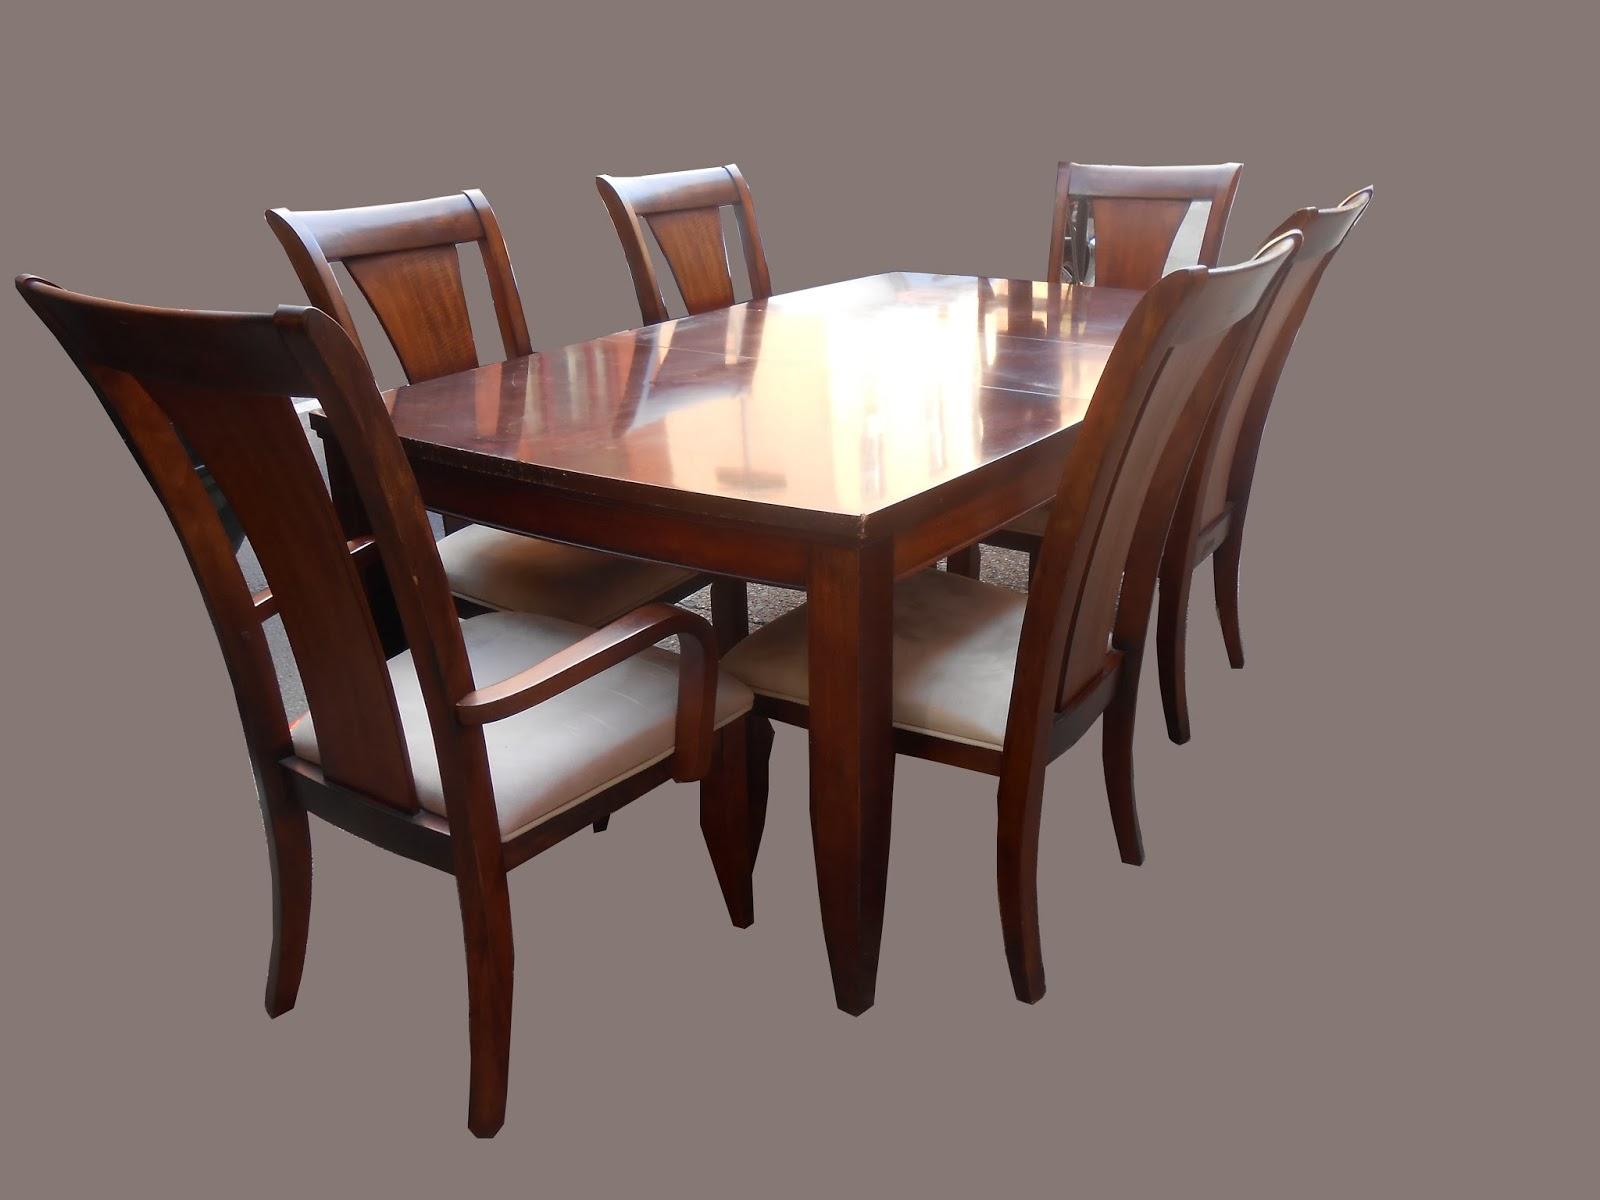 Uhuru Furniture & Collectibles: Mahogany Dining Table w/ 6 ...